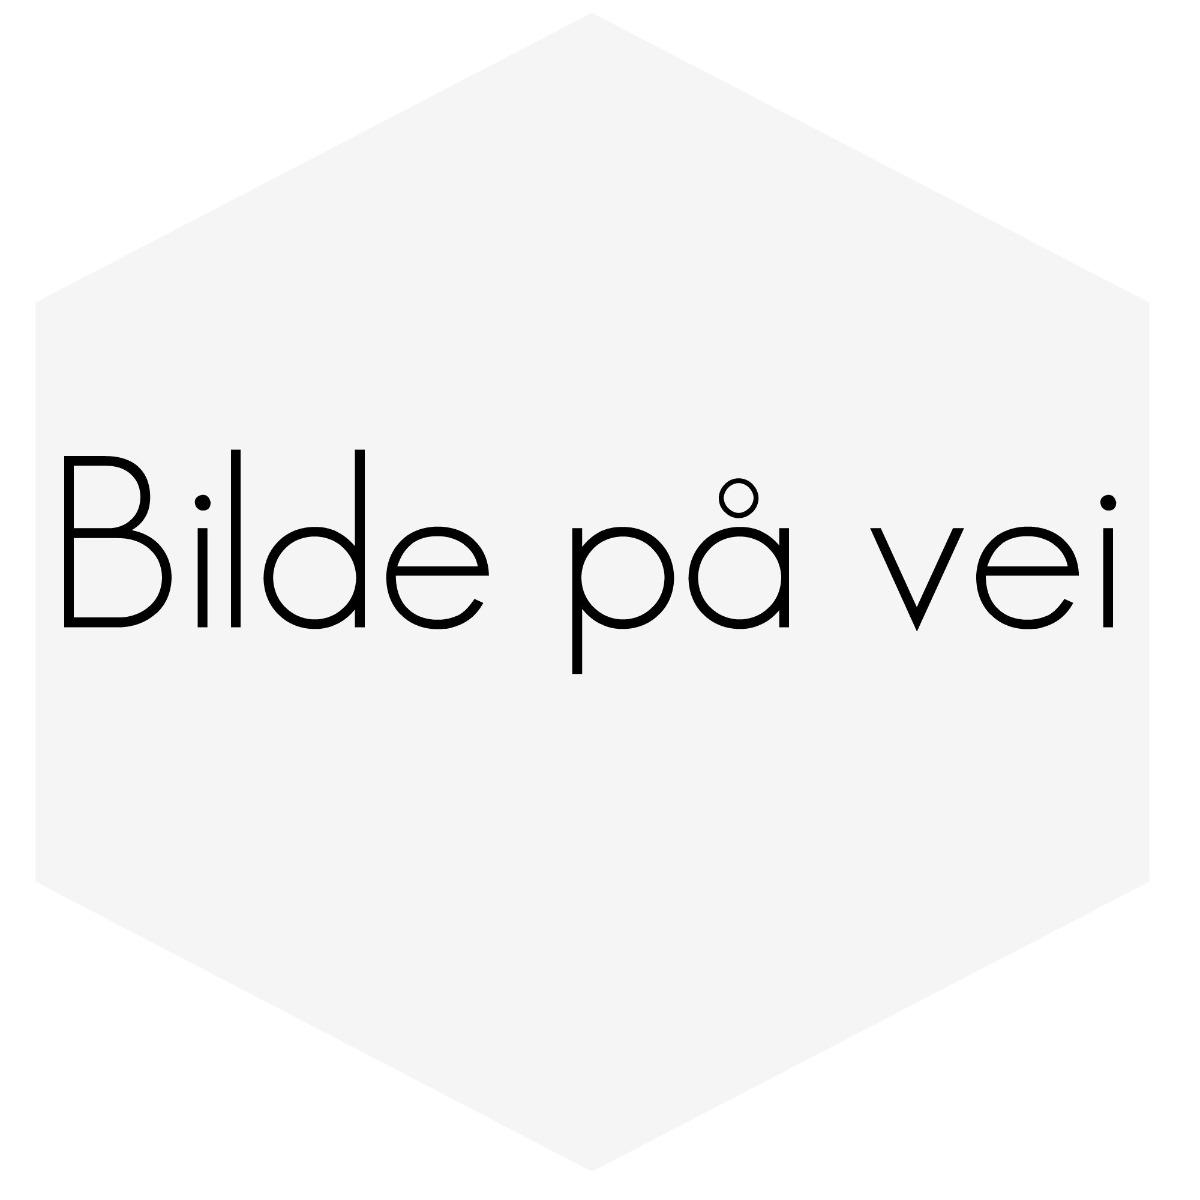 SKVETTLAPP SATS TIL VOLVO S60/V70 00-  FRONT